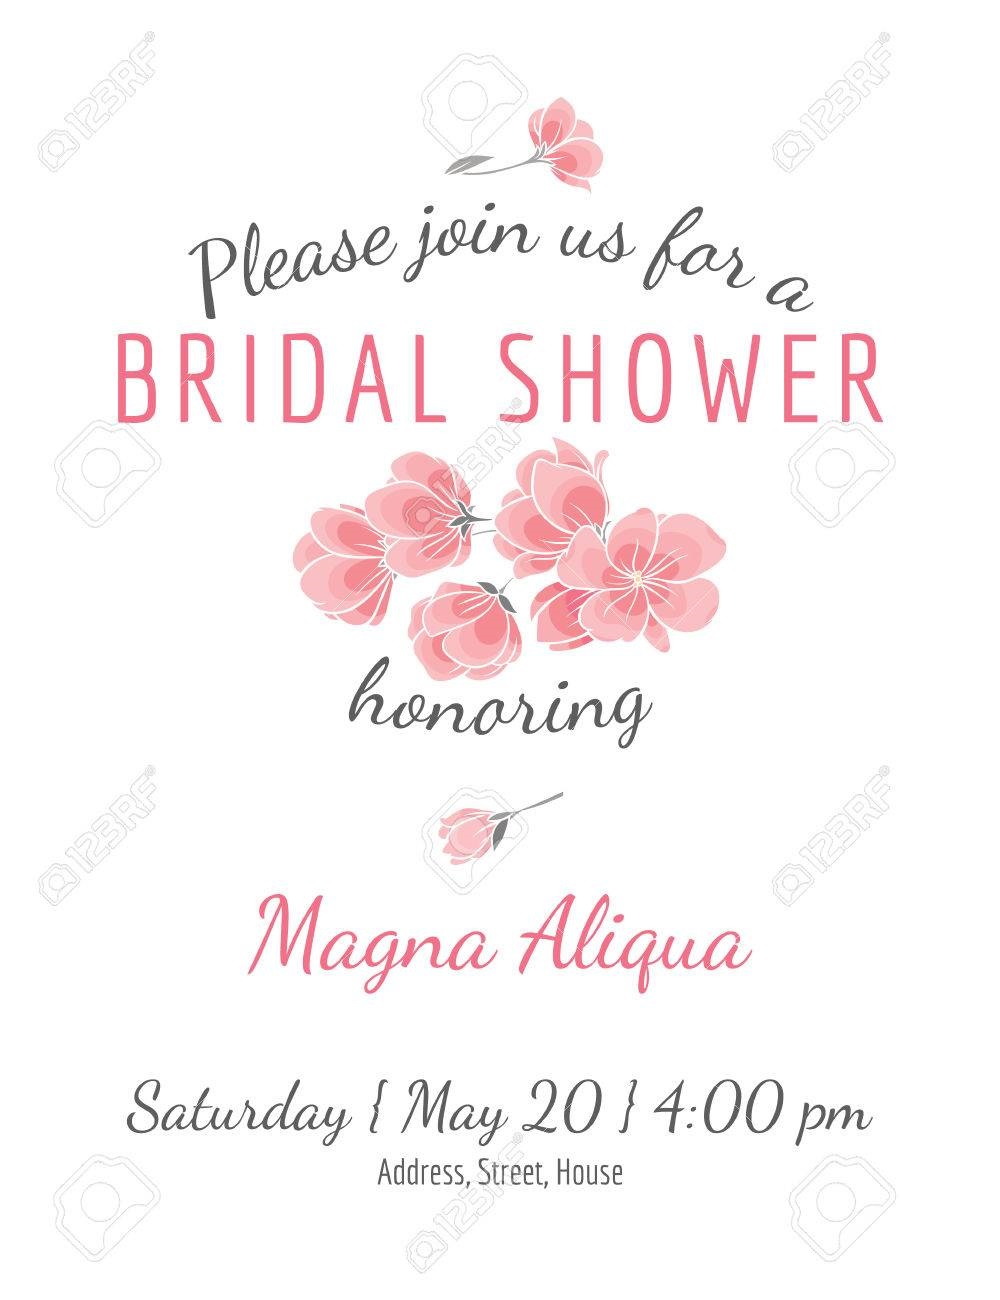 002 Unforgettable Bridal Shower Card Template High Definition  Invitation Free Download BingoFull